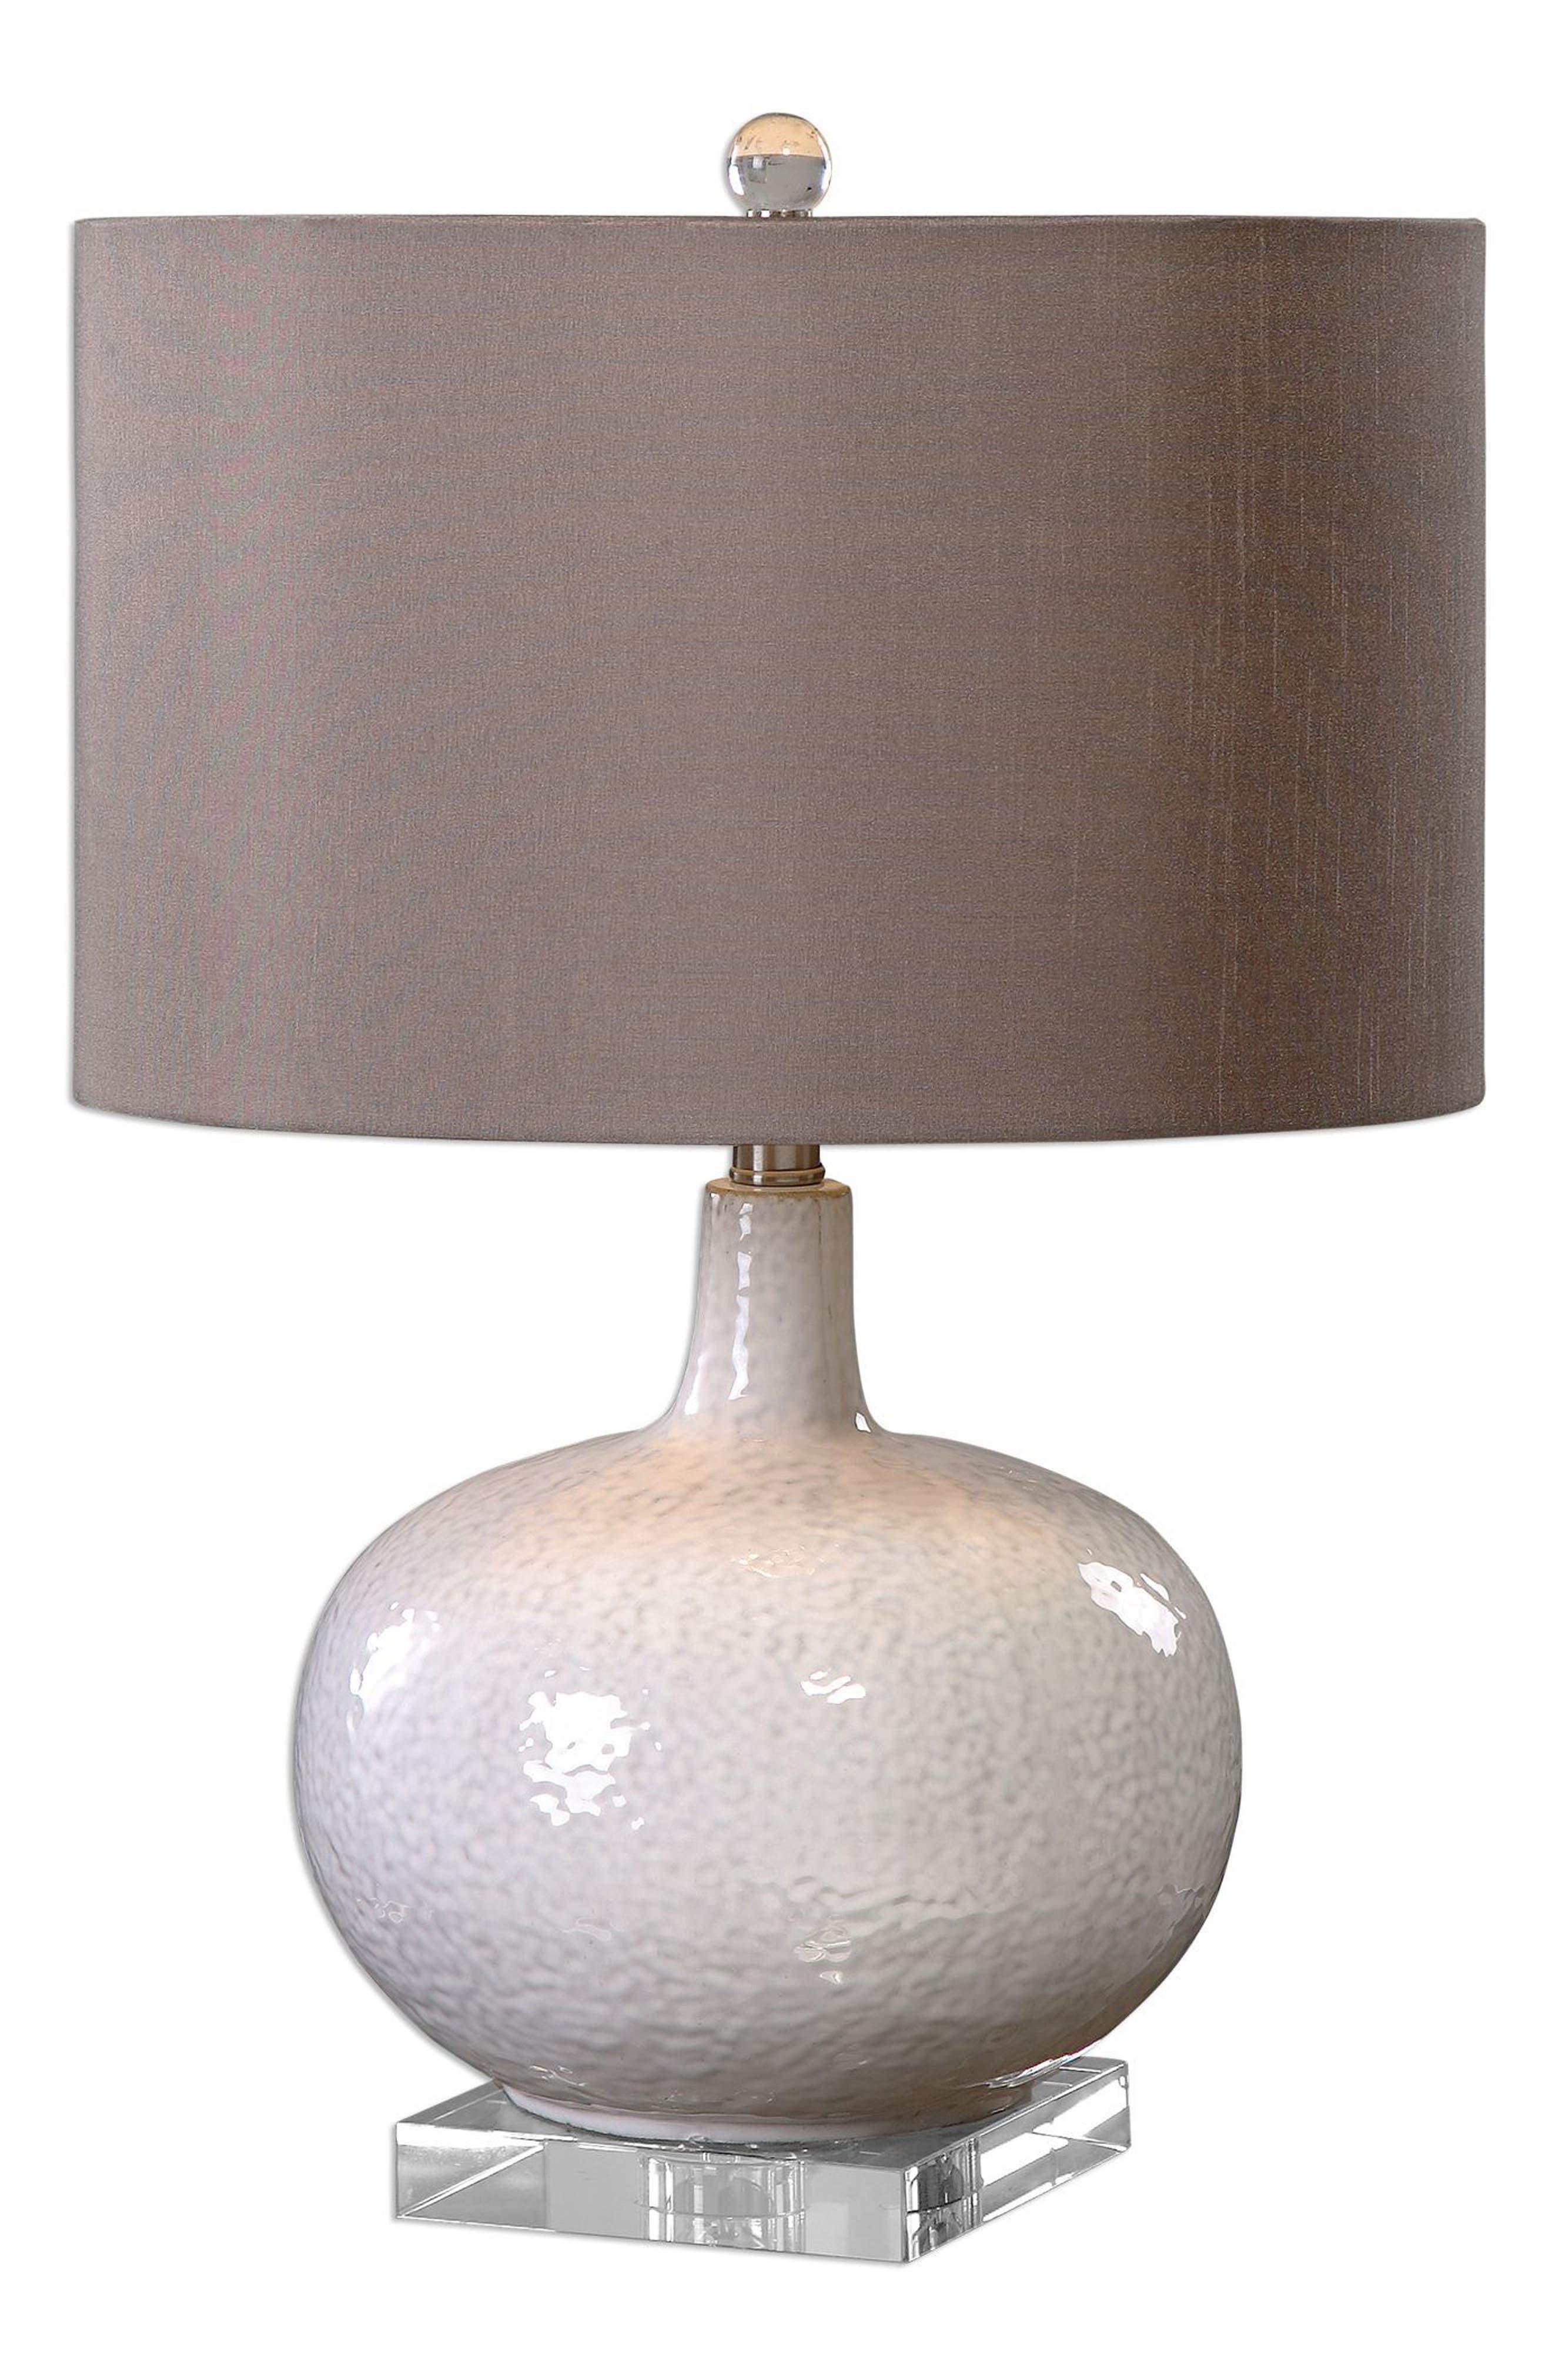 Parvati Table Lamp,                             Main thumbnail 1, color,                             100